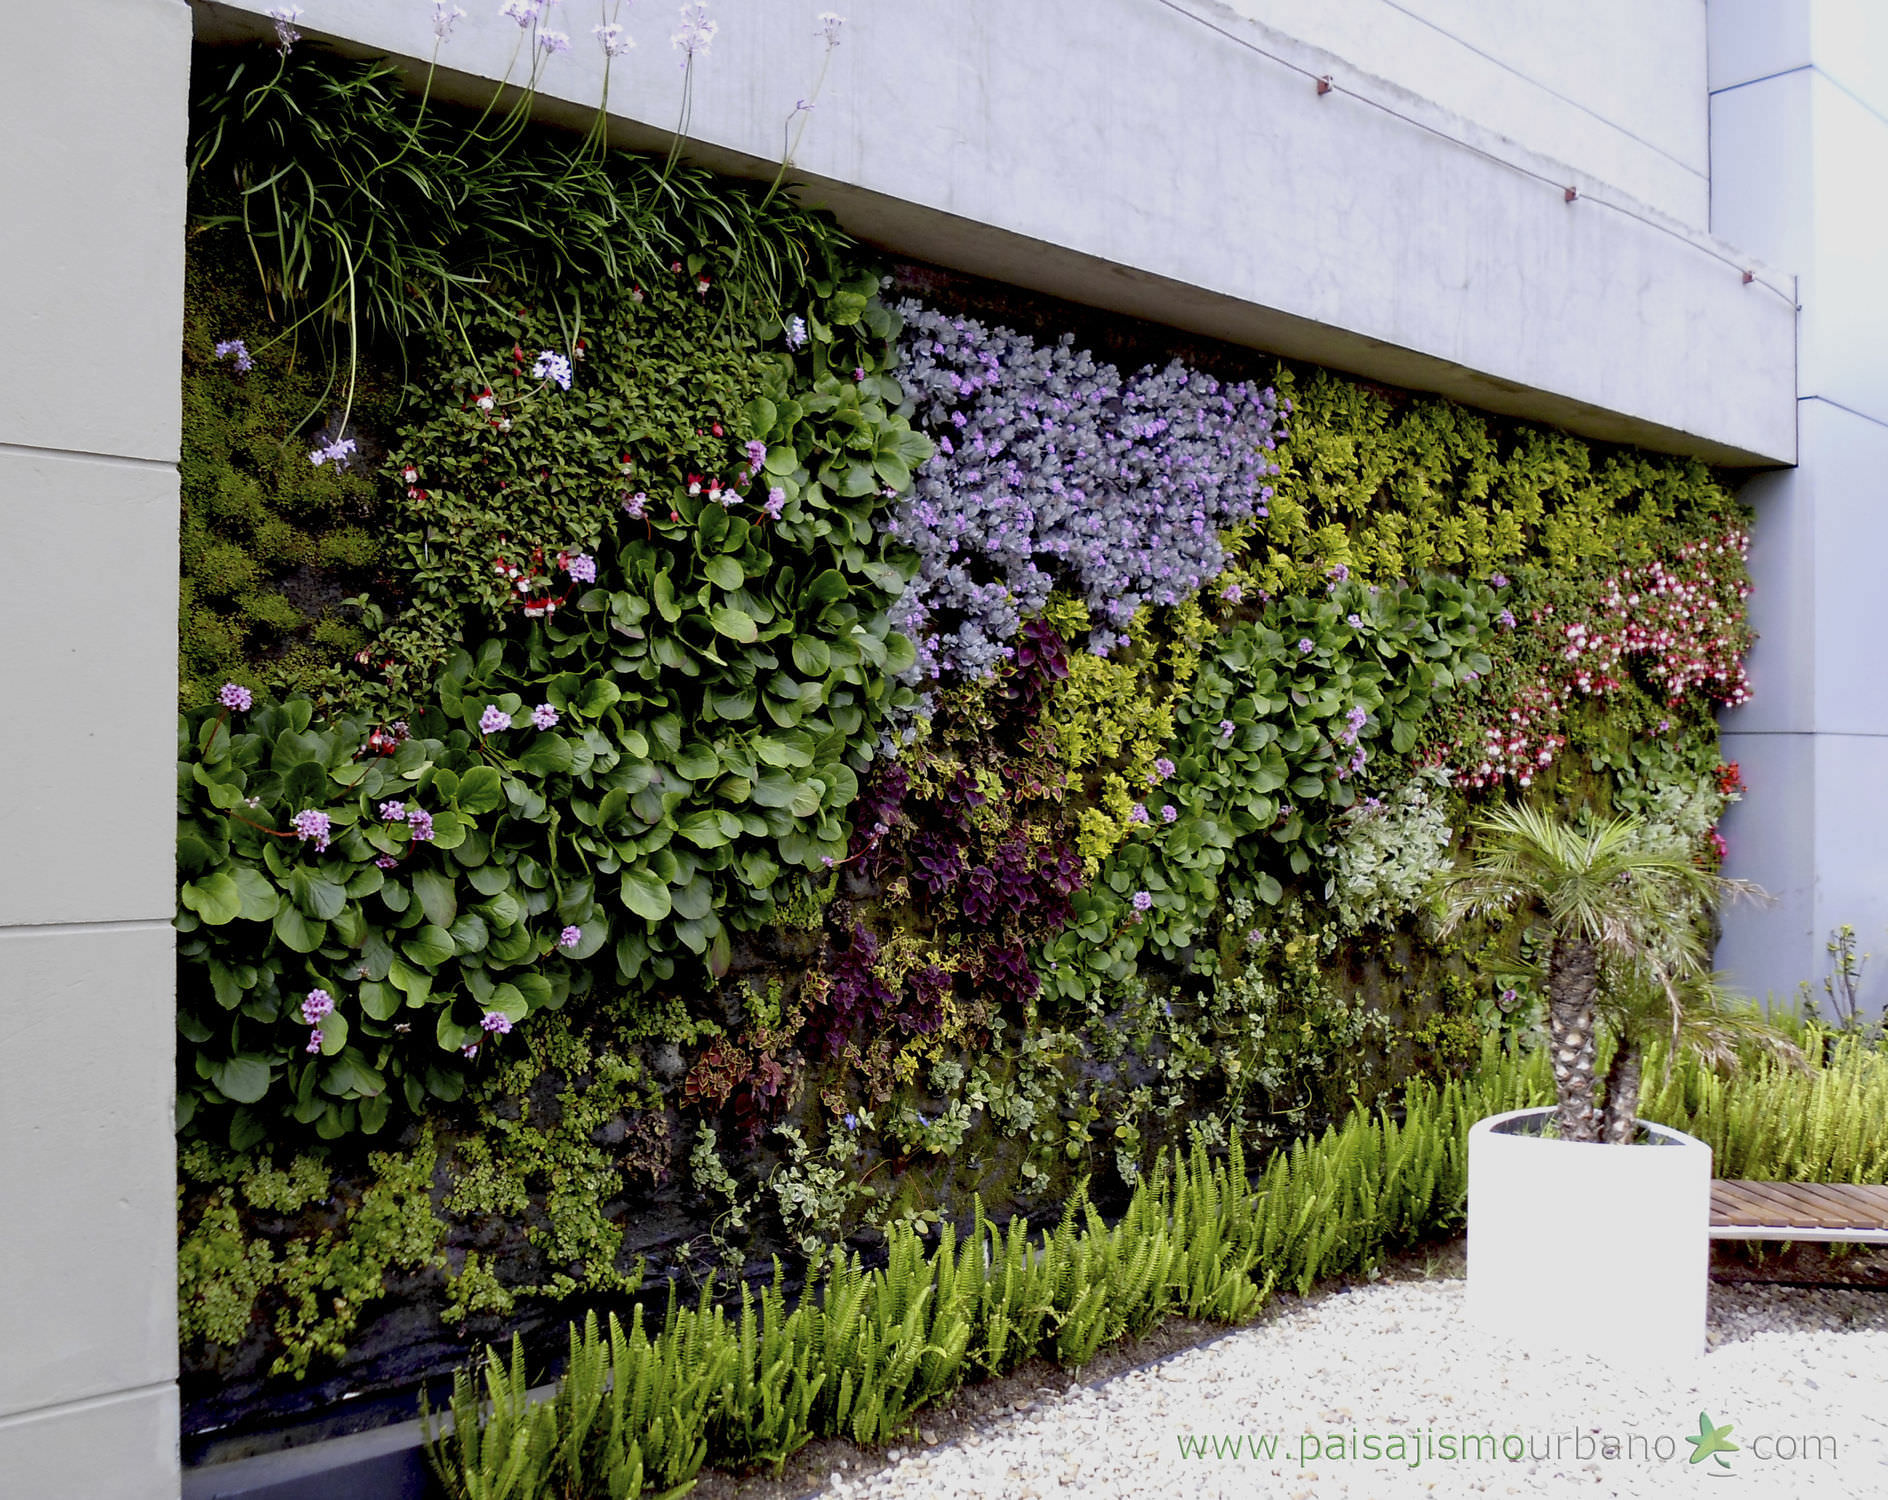 Jardin Verticale exterior green facade - jardin vertical biomax - paisajismo urbano